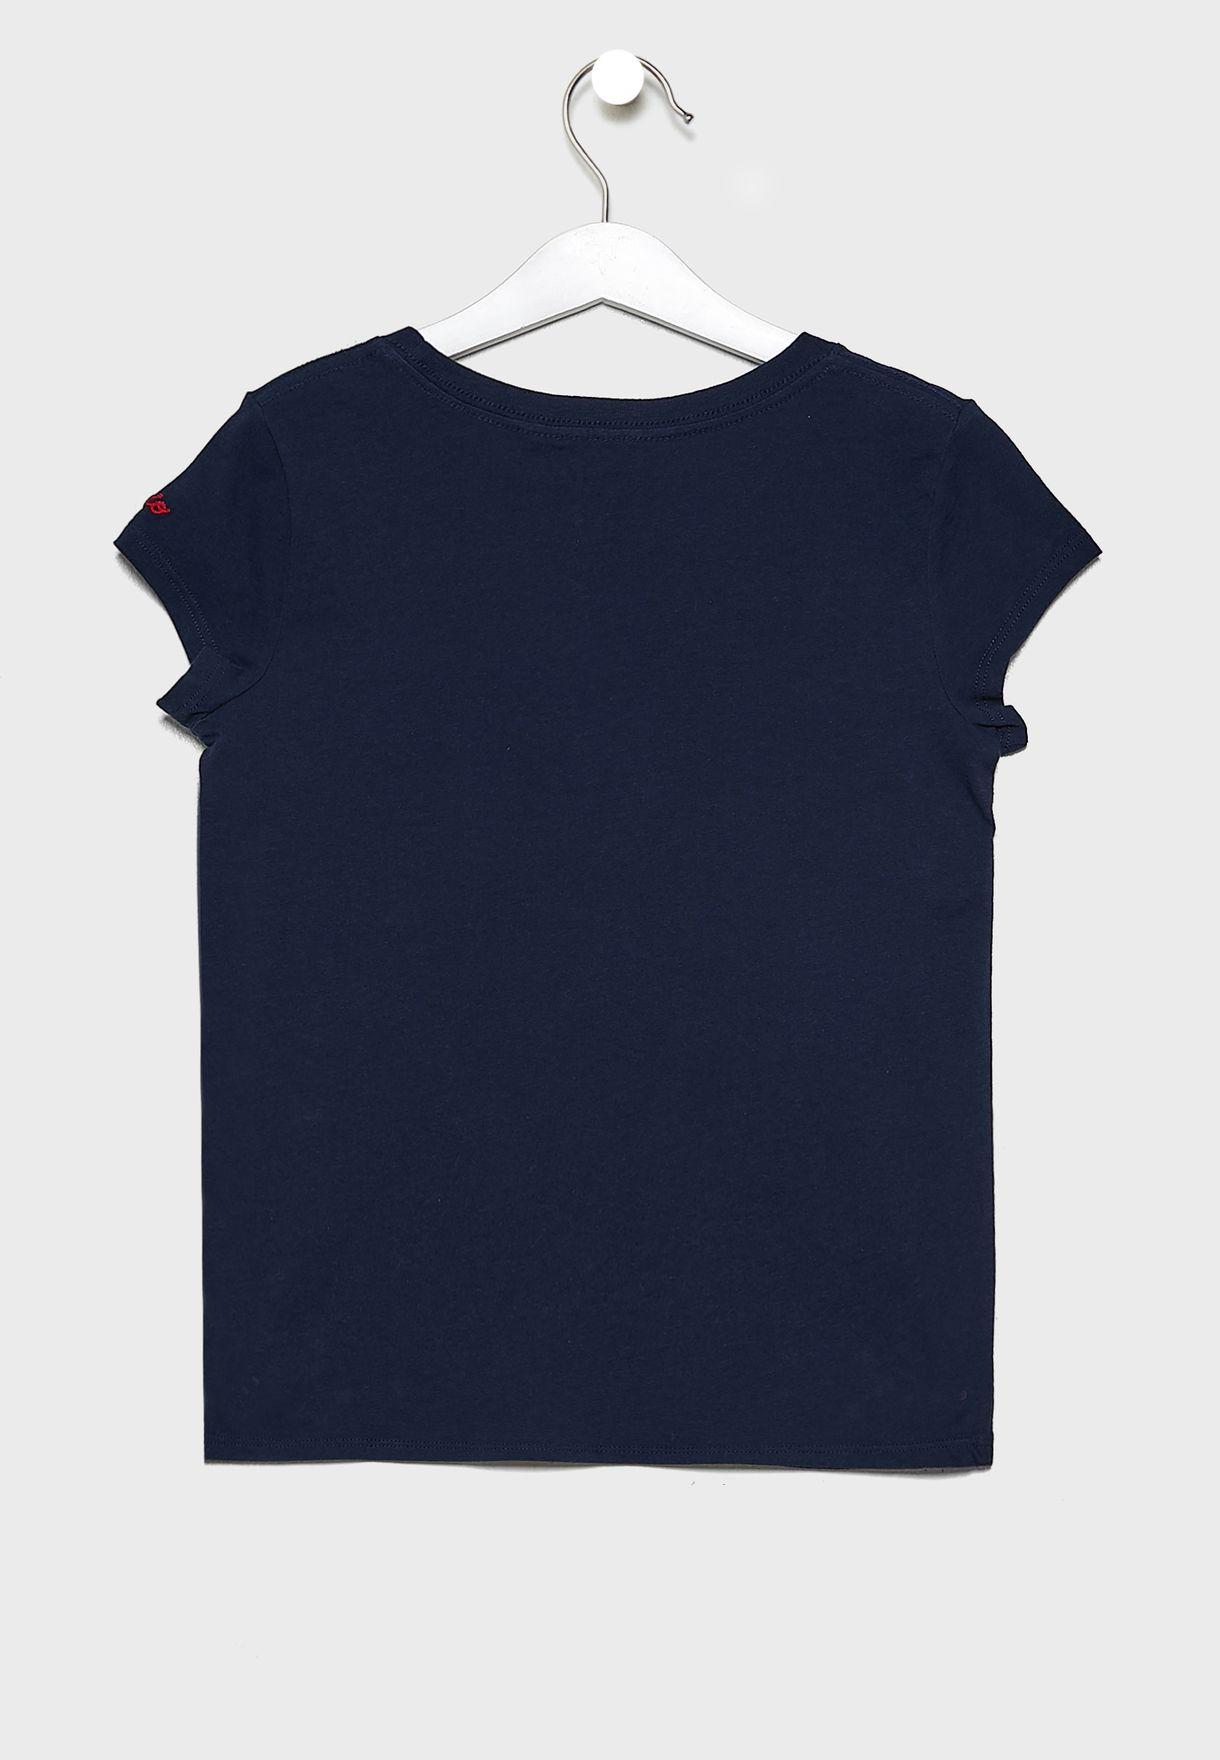 Teen Graphic T-Shirt